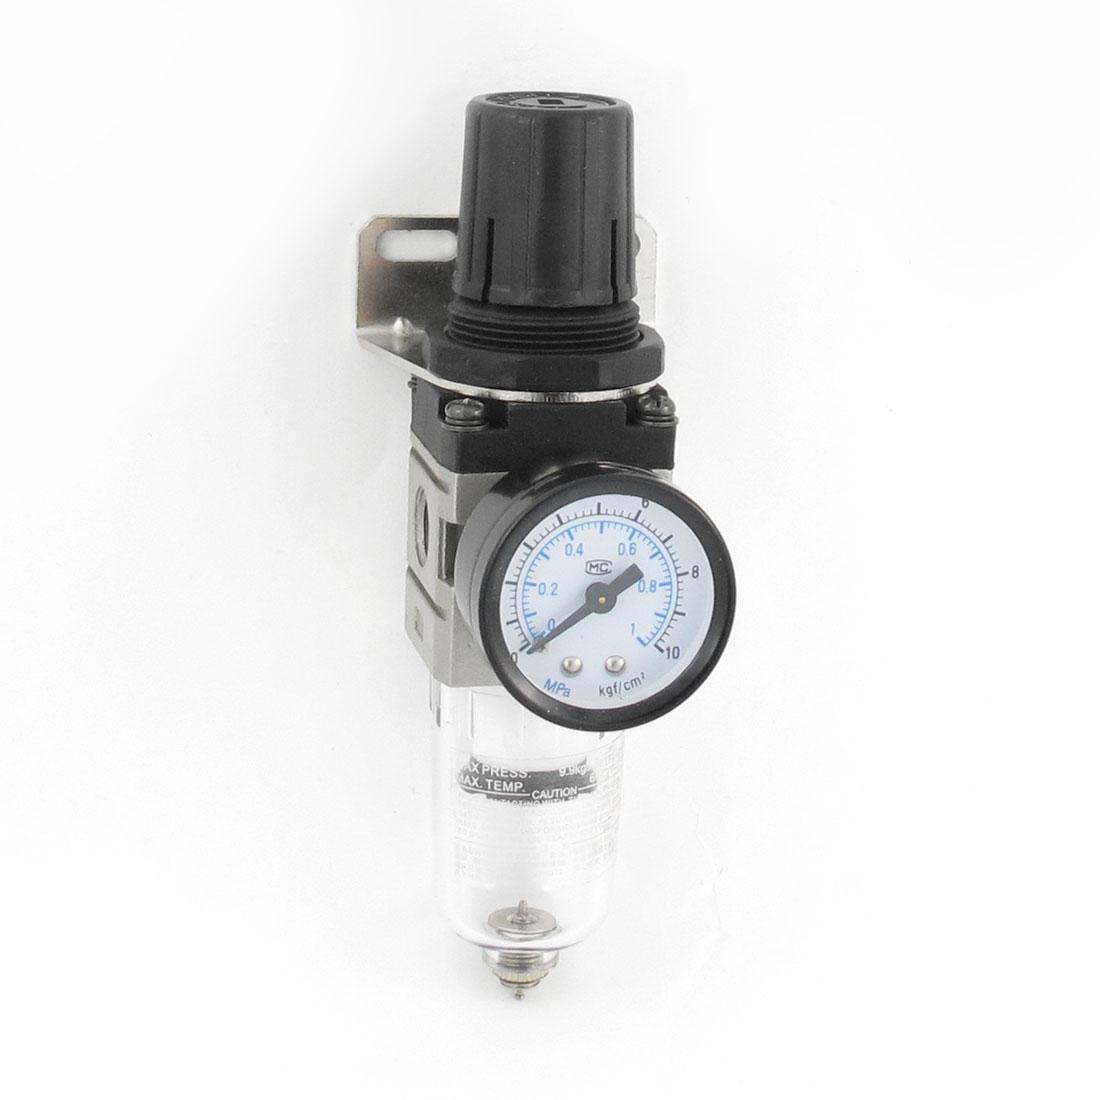 Pneumatic Air Source Treatment Filter Regulator w Pressure Gauge AW2000-02